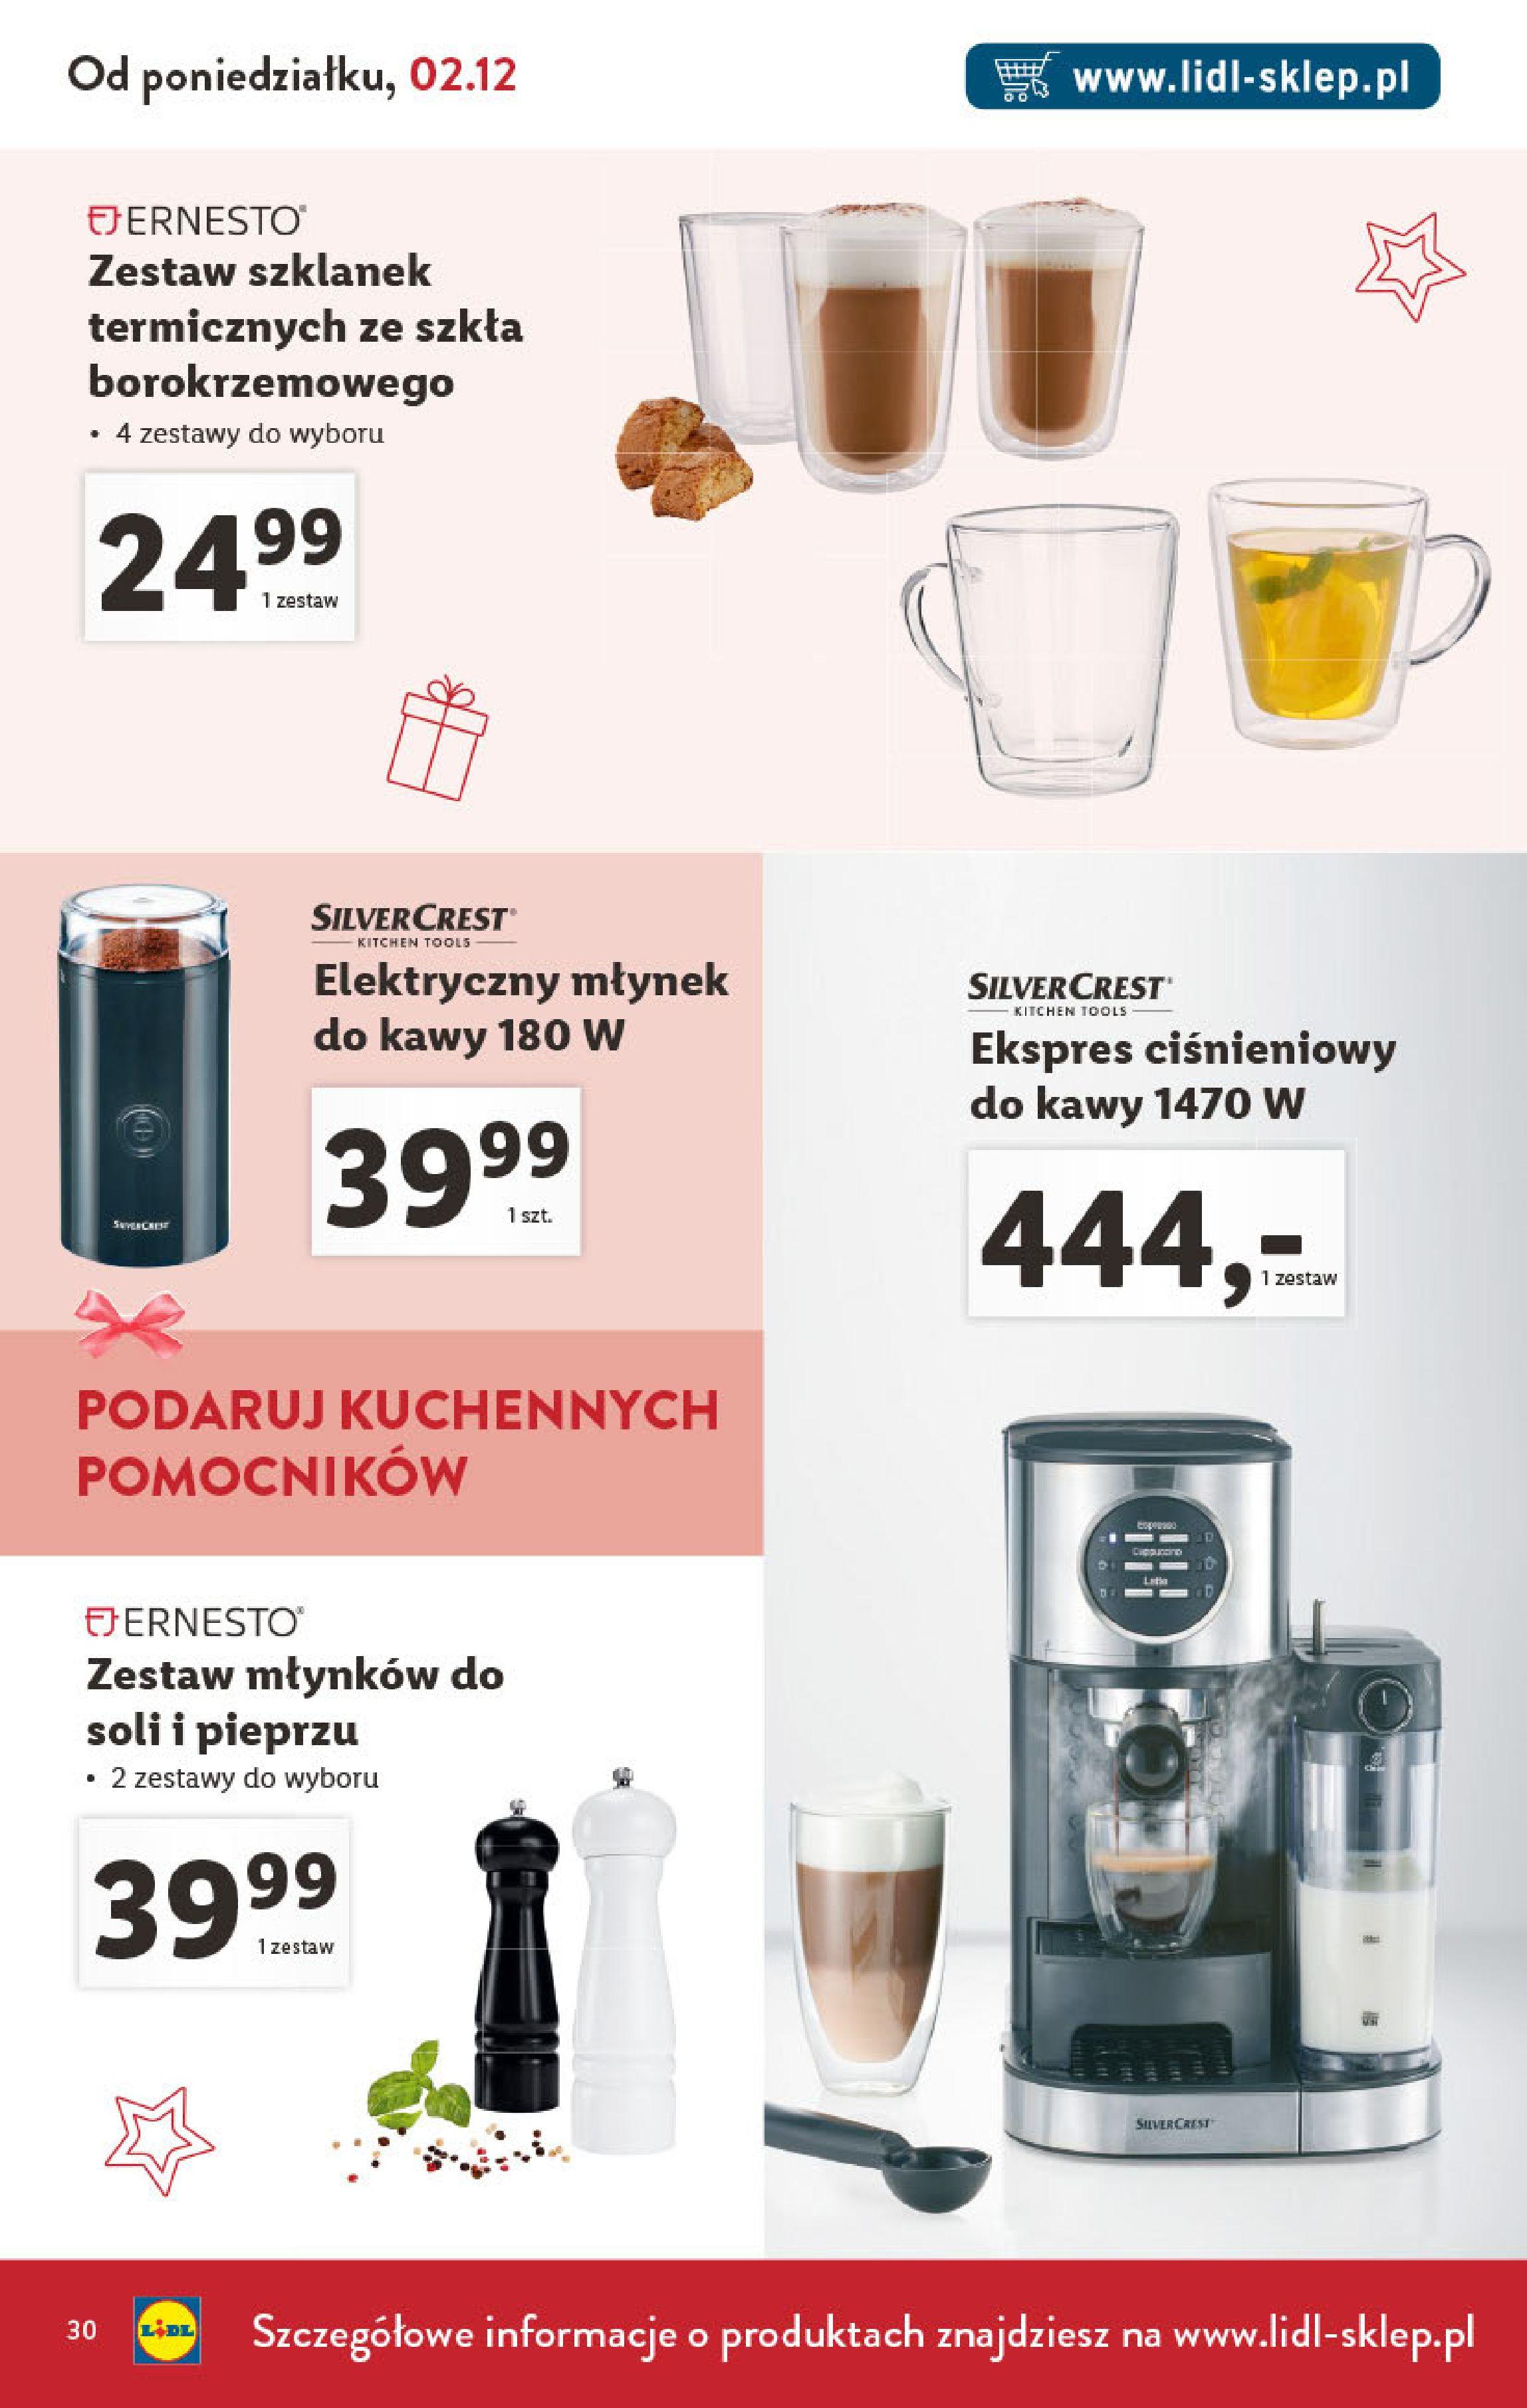 Gazetka Lidl - Katalog Online-13.10.2019-02.12.2019-page-30